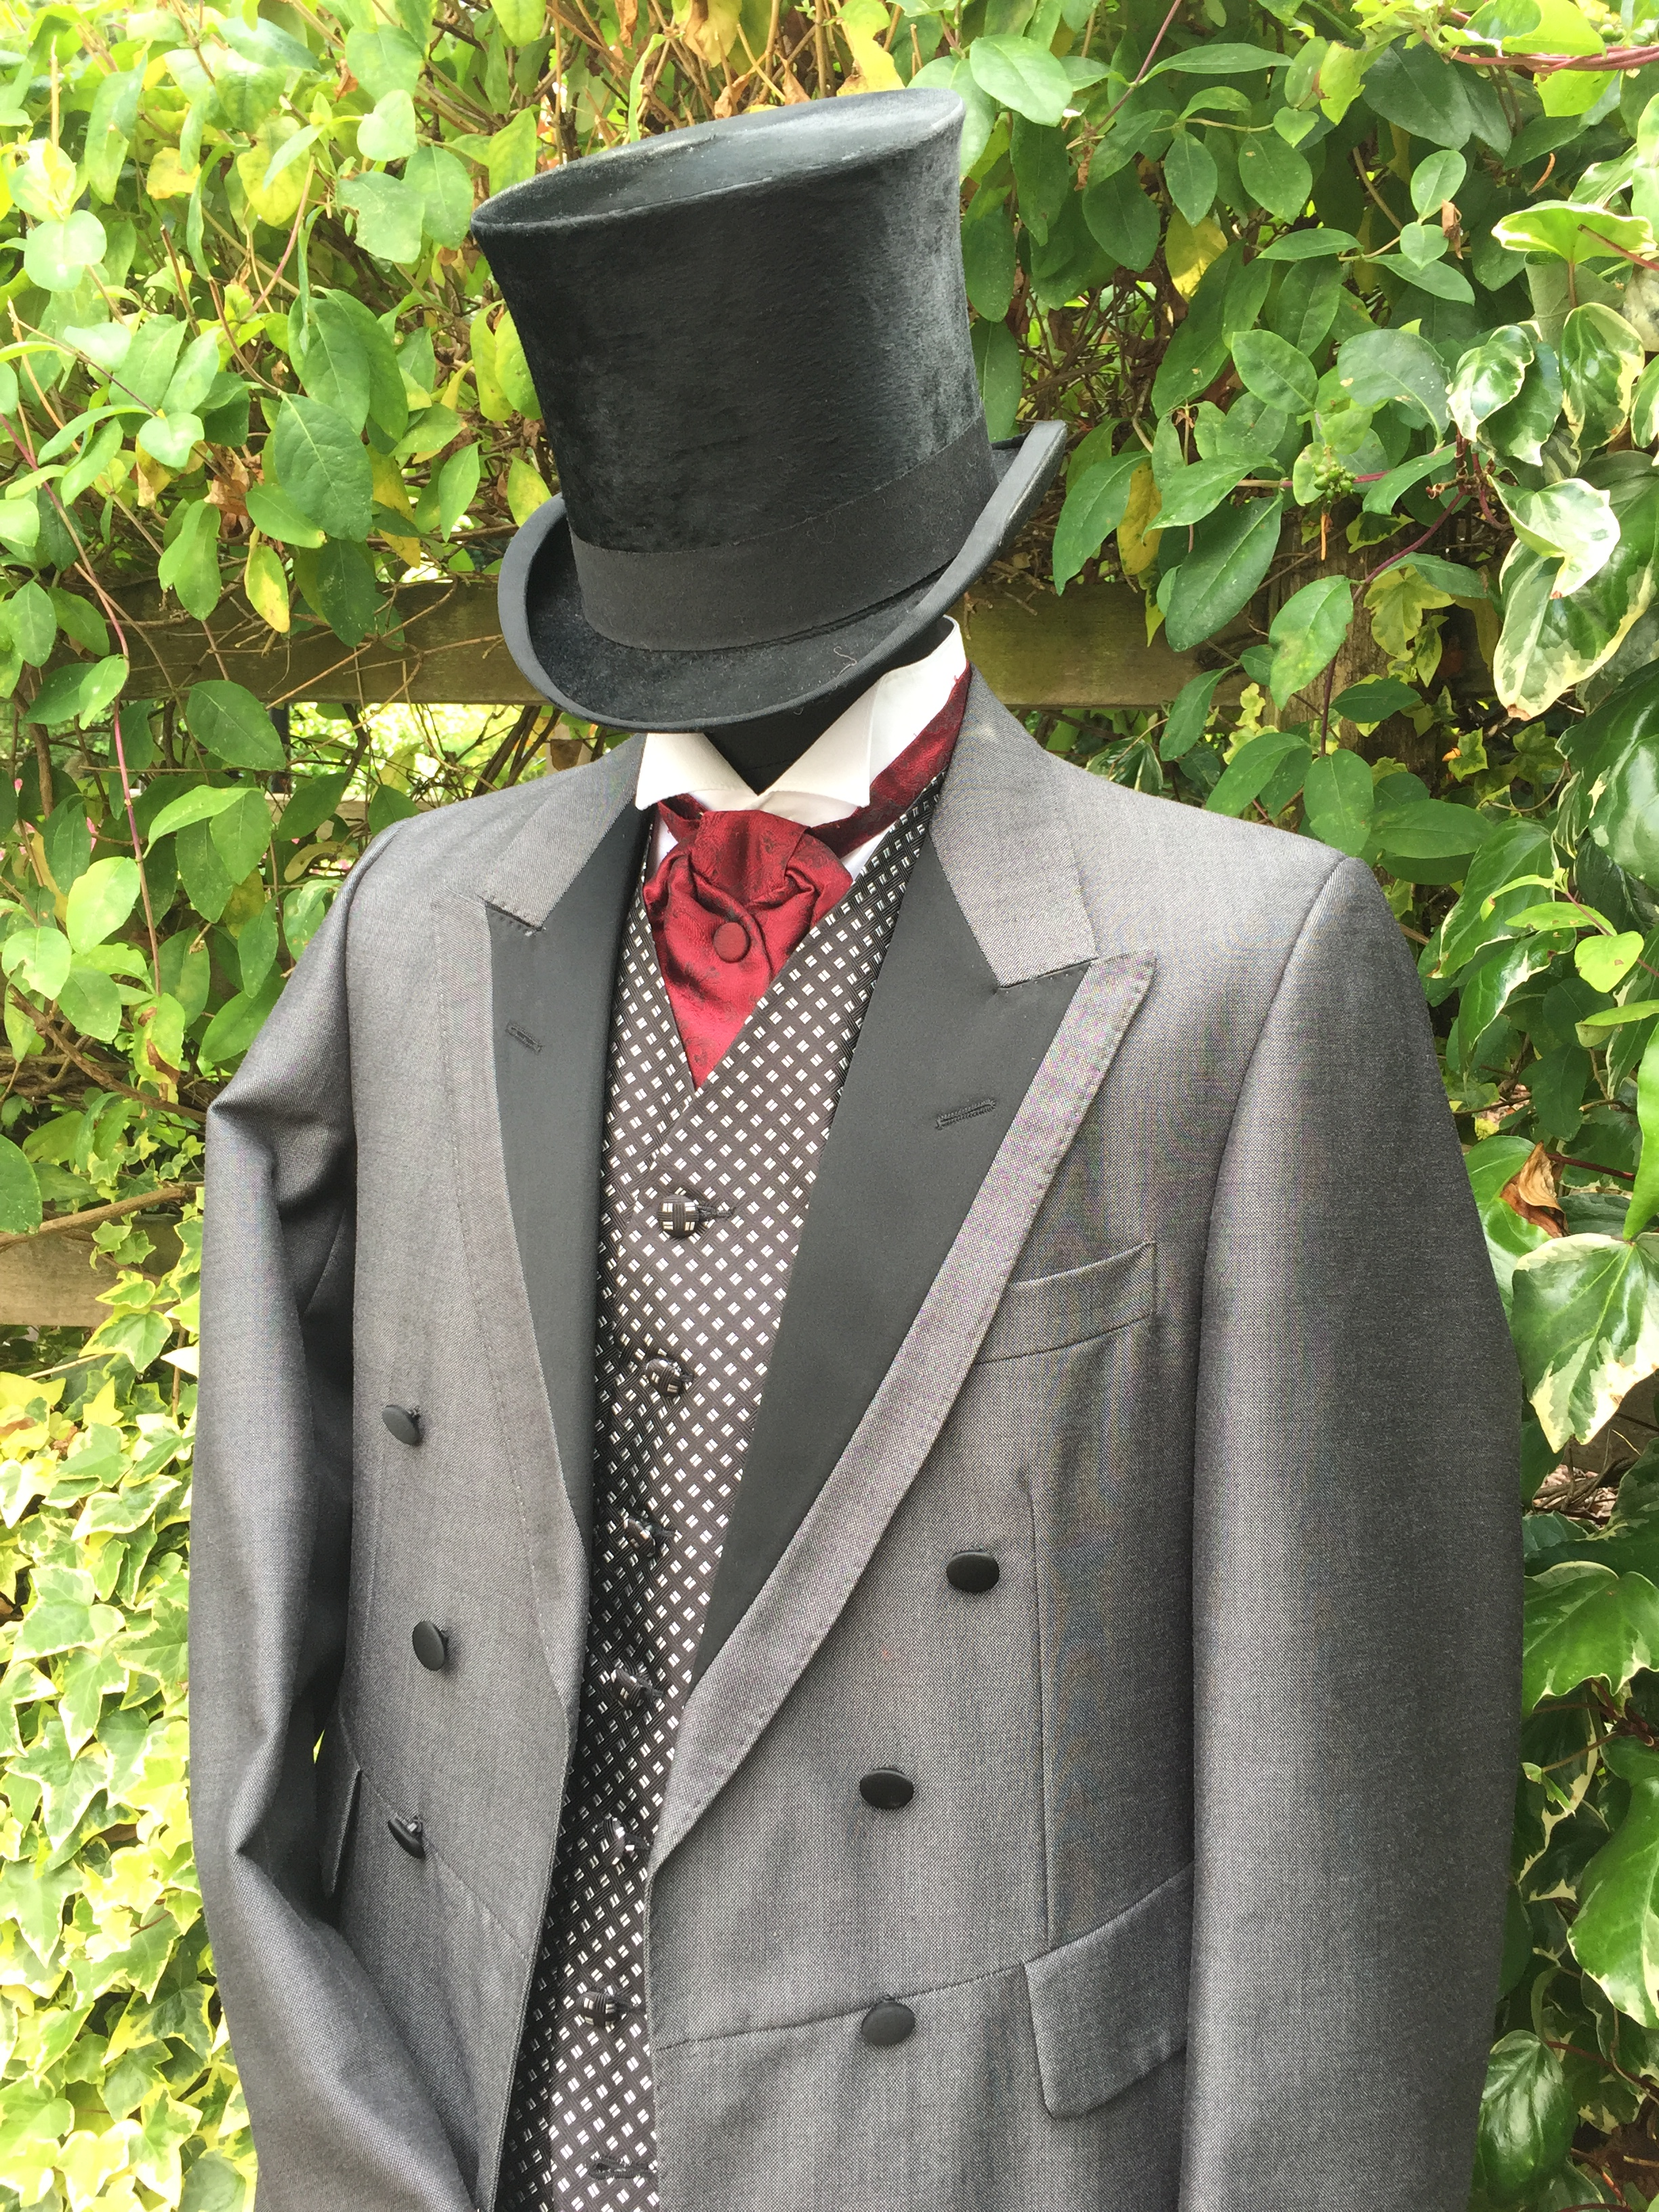 Masquerade Bram Stoker Dracula Costume Masquerade